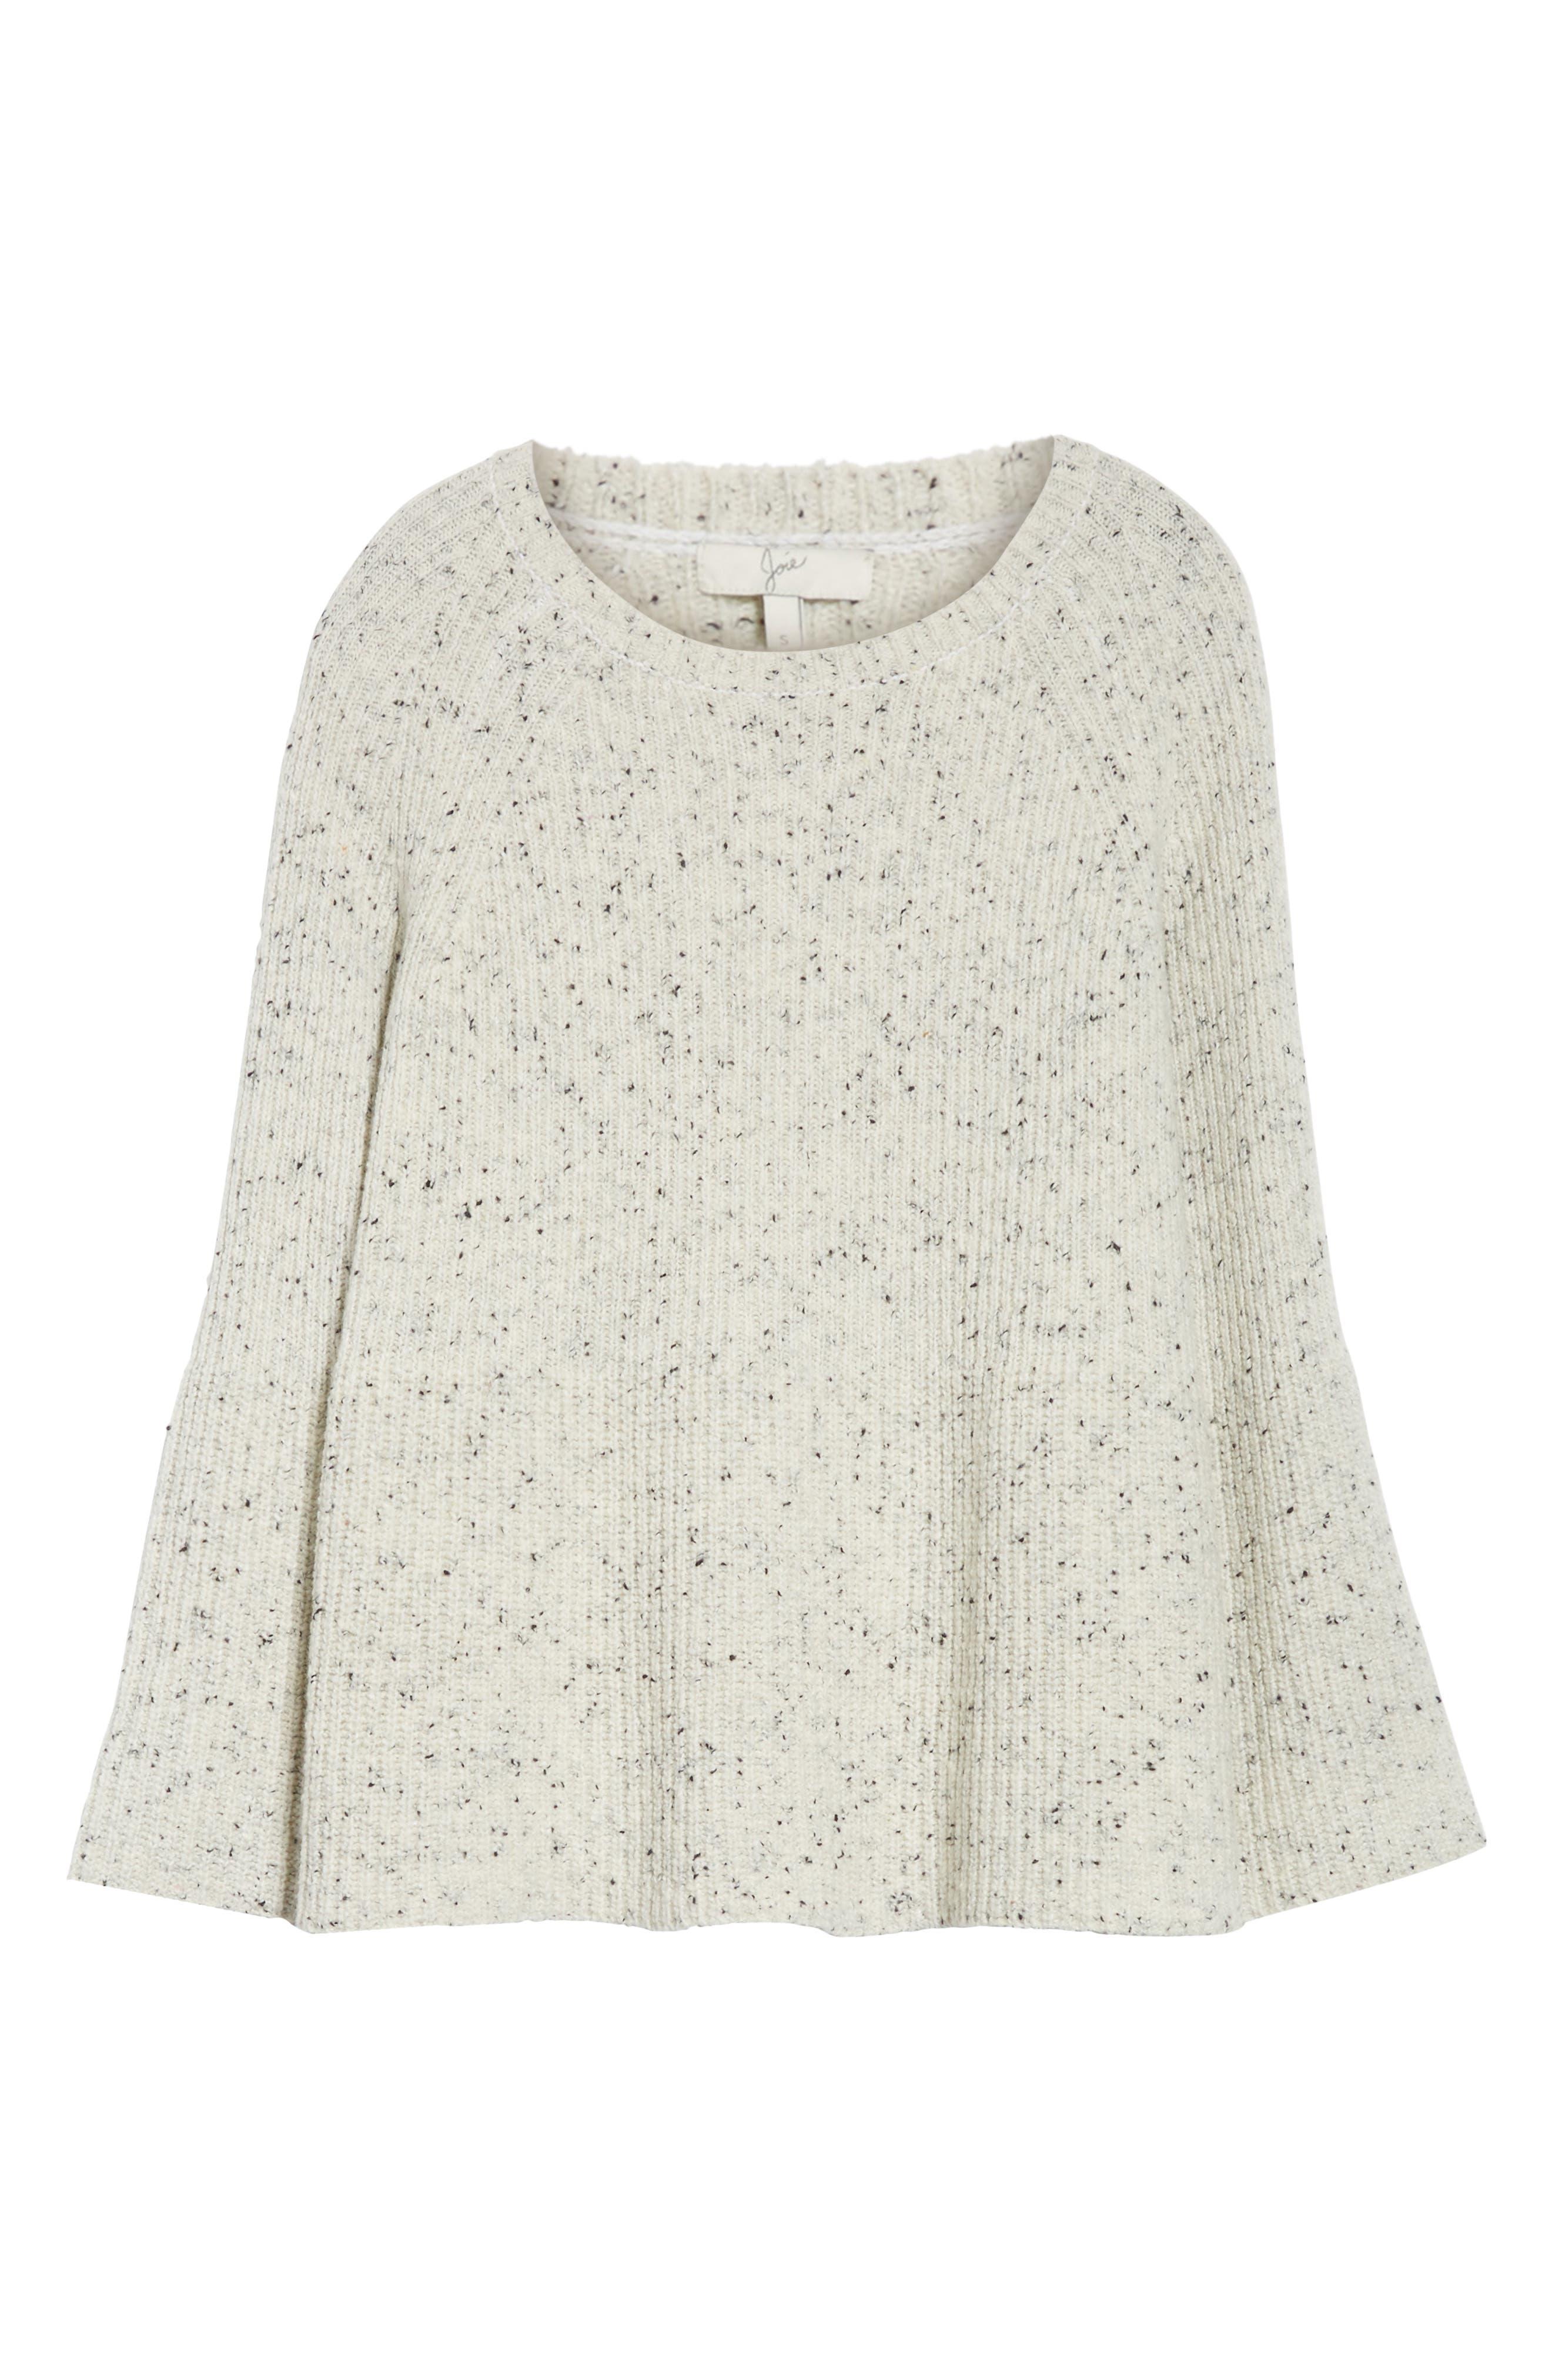 Paden Wool Blend Sweater,                             Alternate thumbnail 6, color,                             114